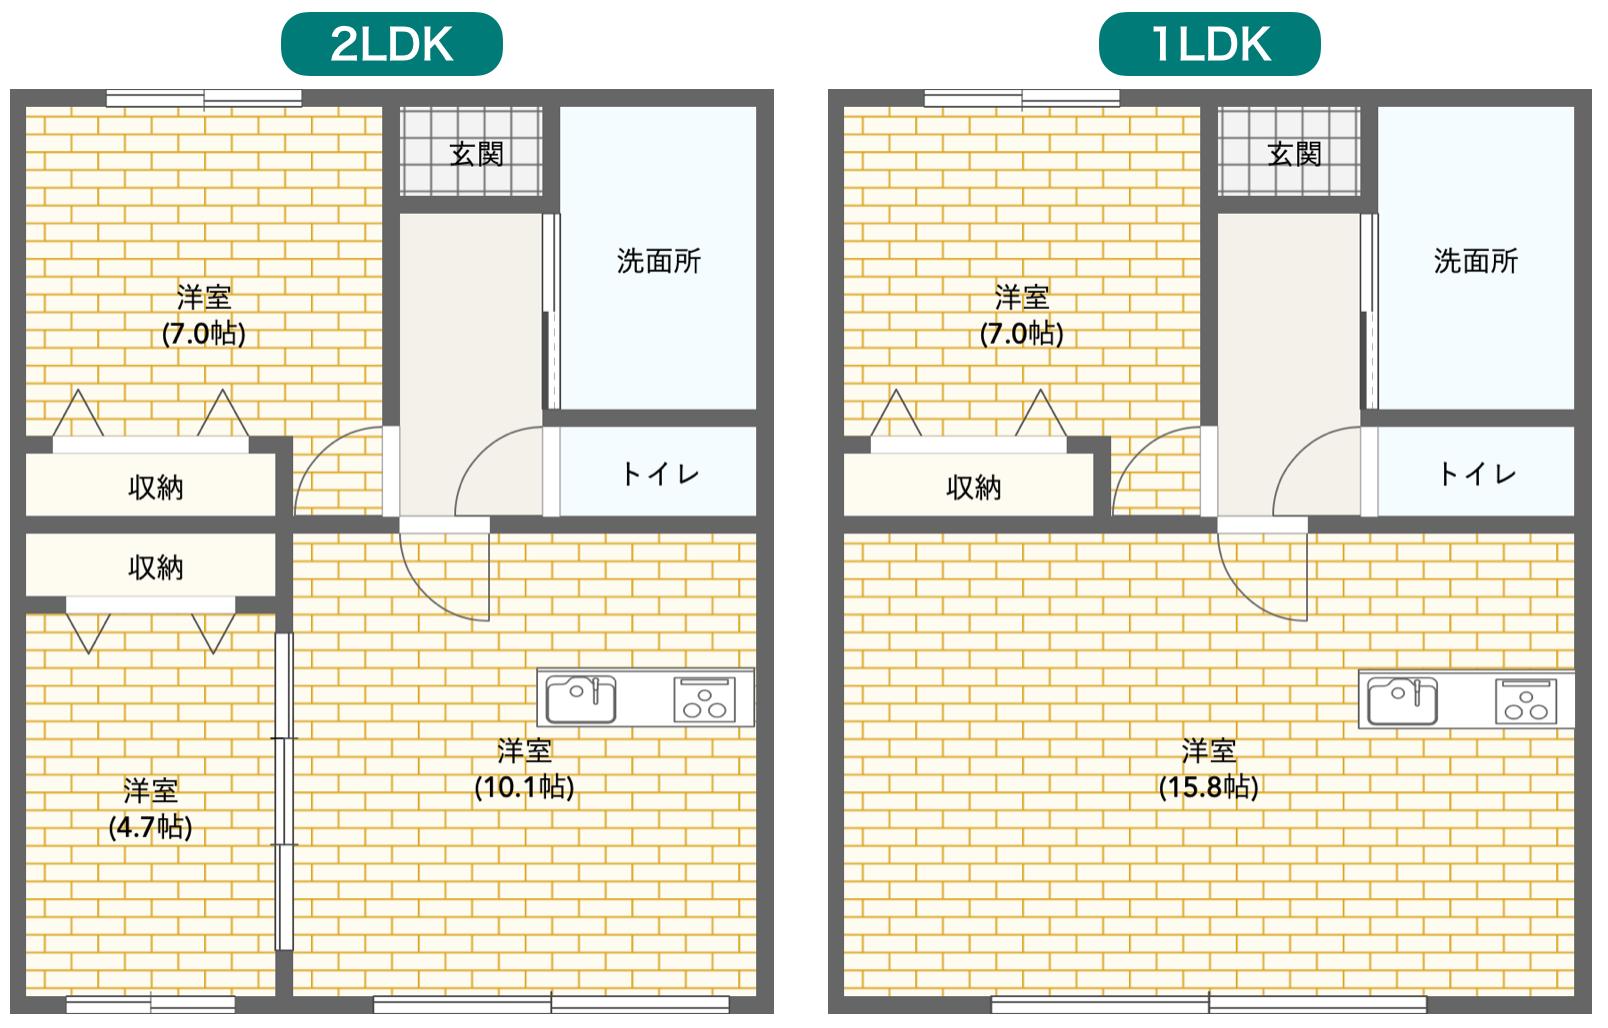 2LDKと1LDKの間取り図比較